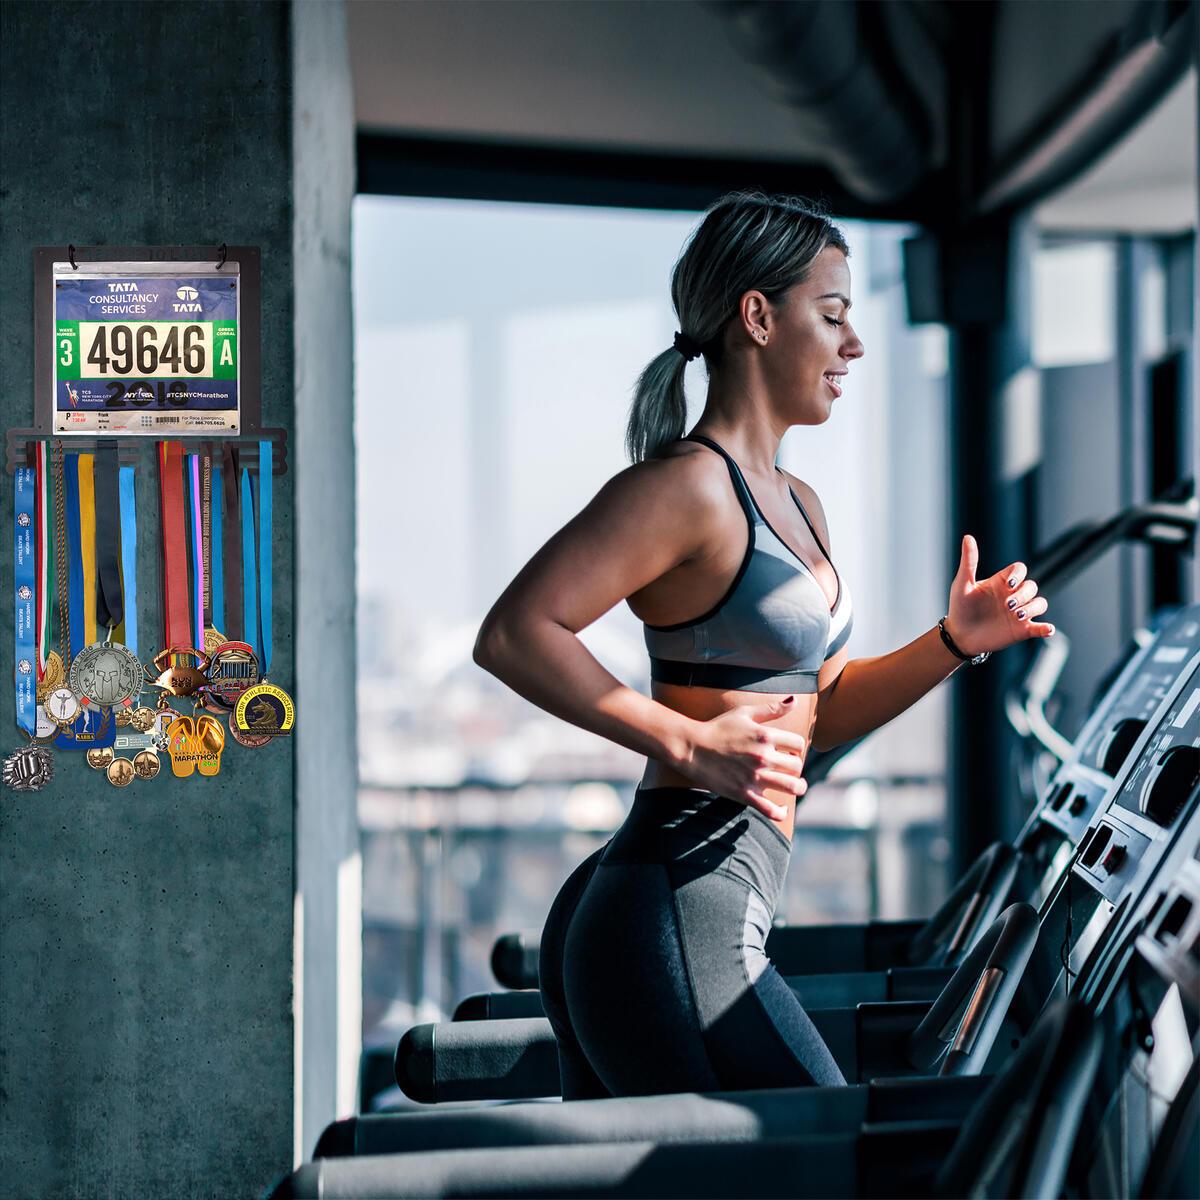 BAZPO Medal Display Hanger for 5K, 10K, 21K, Marathon Runners, Gymnastics, Cheer, Wrestling, Soccer, Football Athletes | Medal Awards Rack Holds 200+ Medals and Race Bibs (8x9 in.) Combined